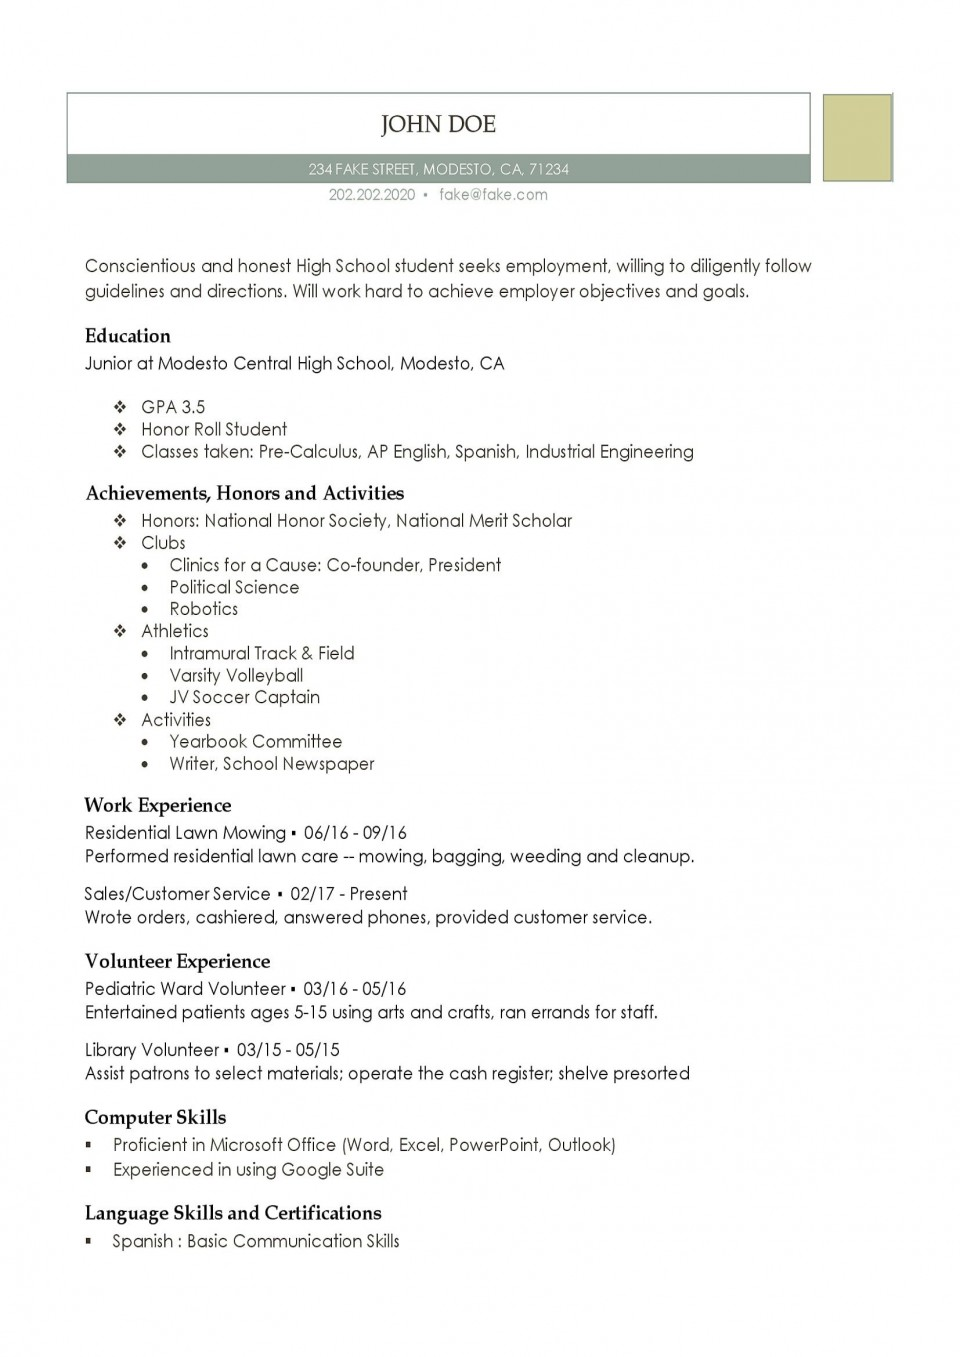 003 Unforgettable Free High School Resume Template Microsoft Word Inspiration 960